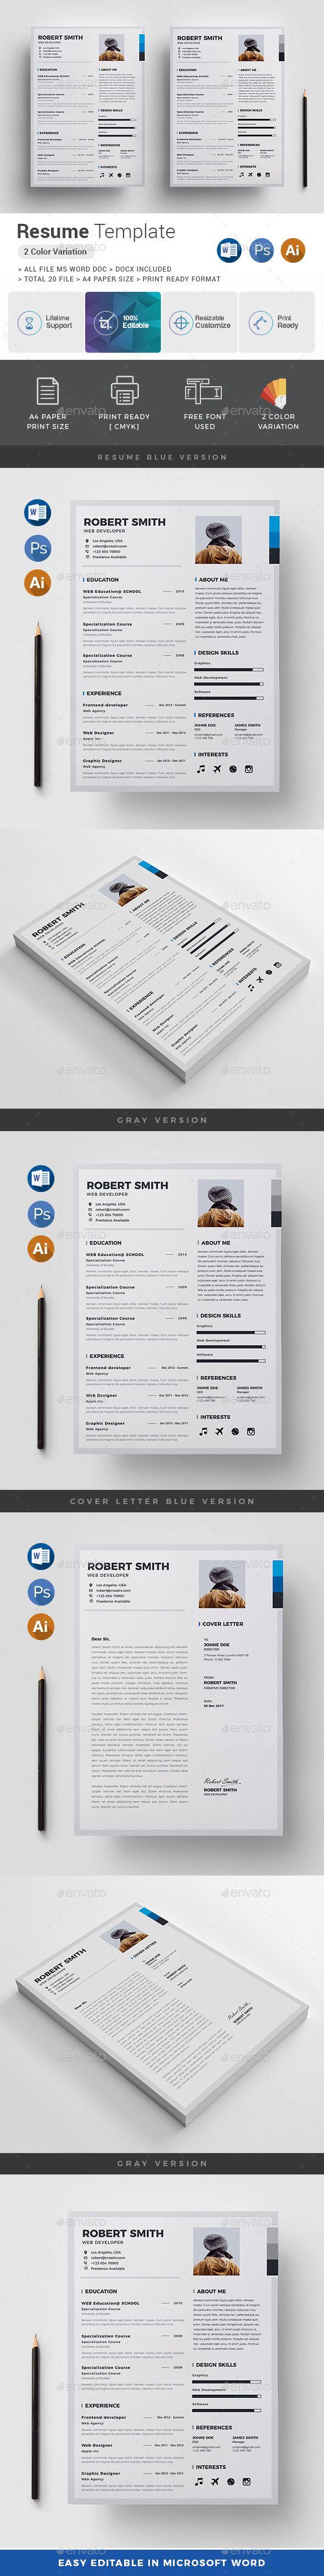 Resumedoc 677 Best Resume 2018 Images On Pinterest